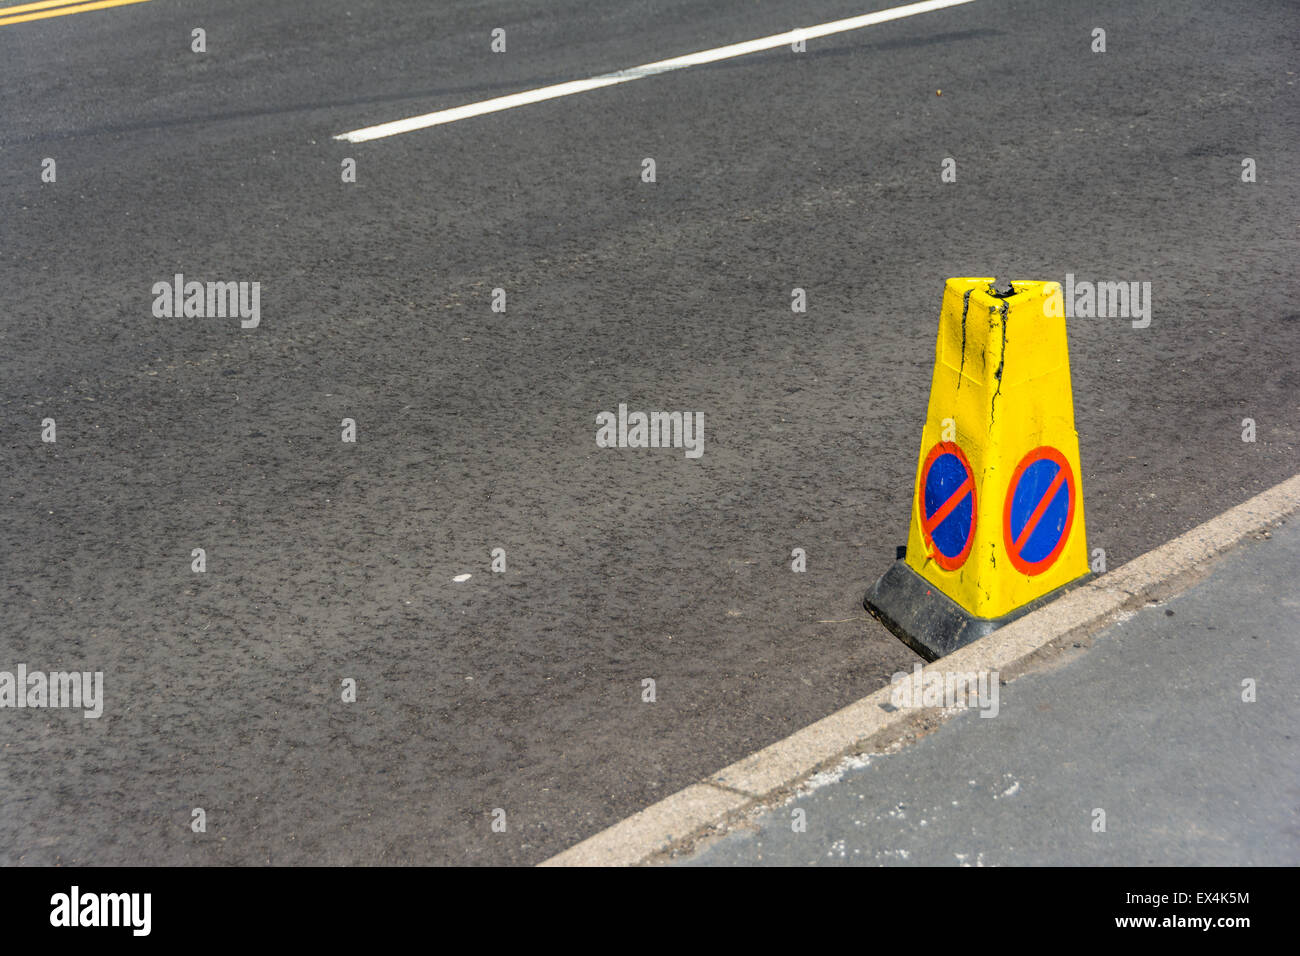 No Parking! - Stock Image